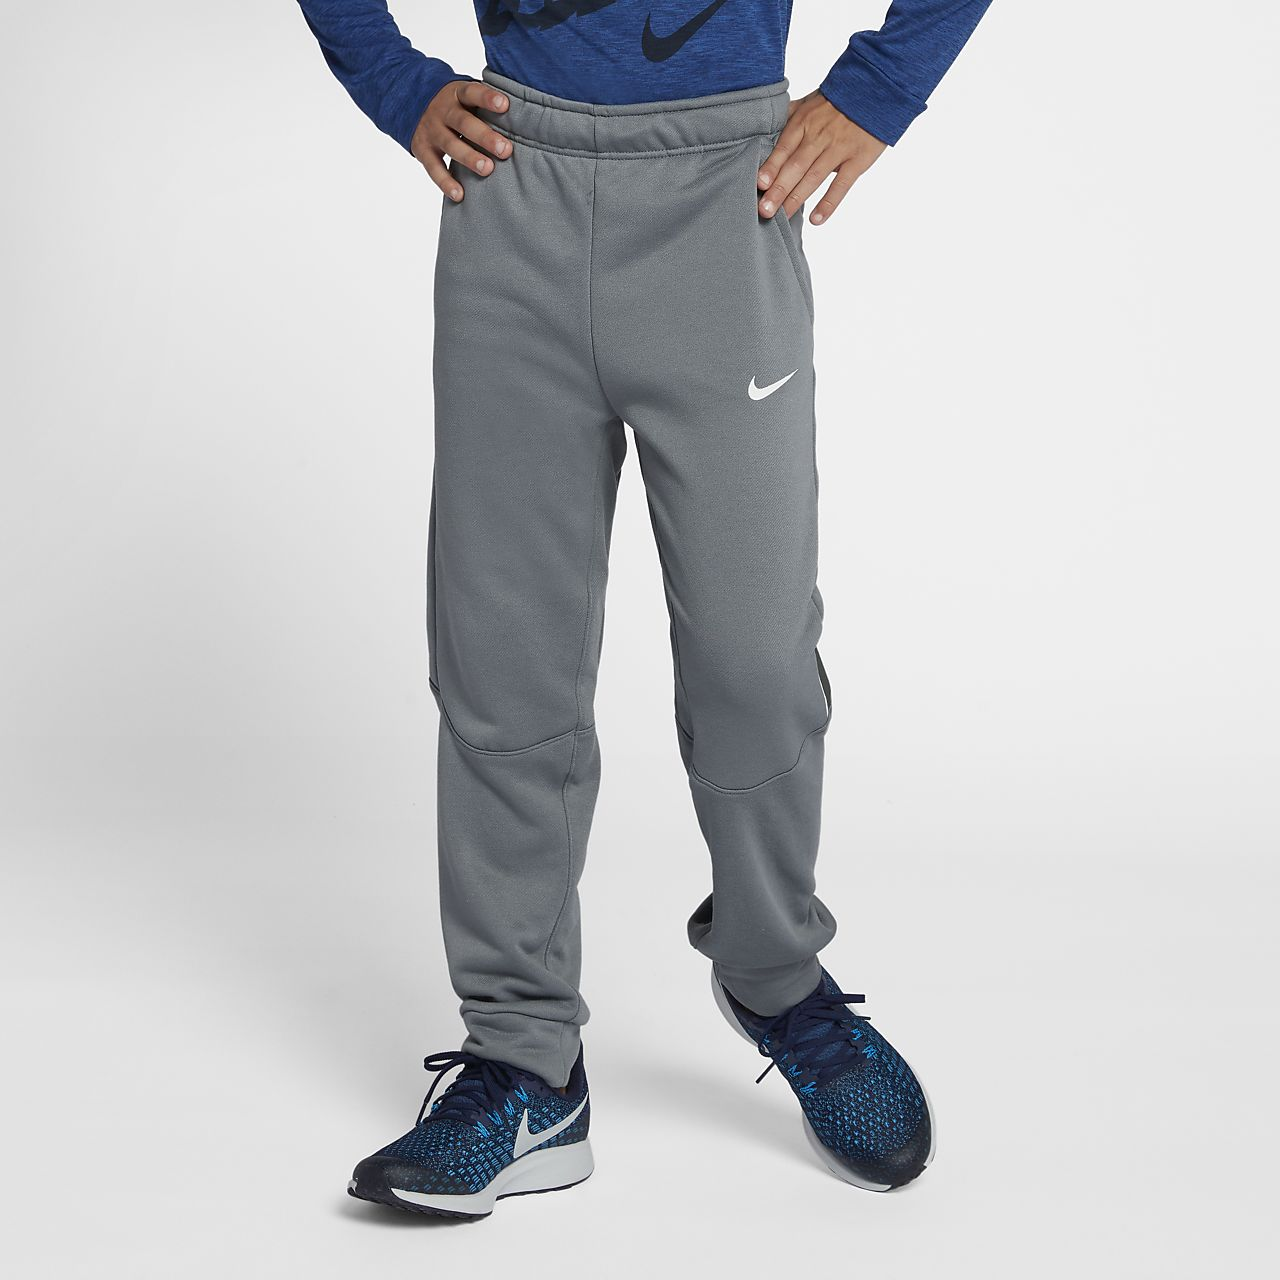 Nike Dri-FIT Big Kids' (Boys') Training Pants